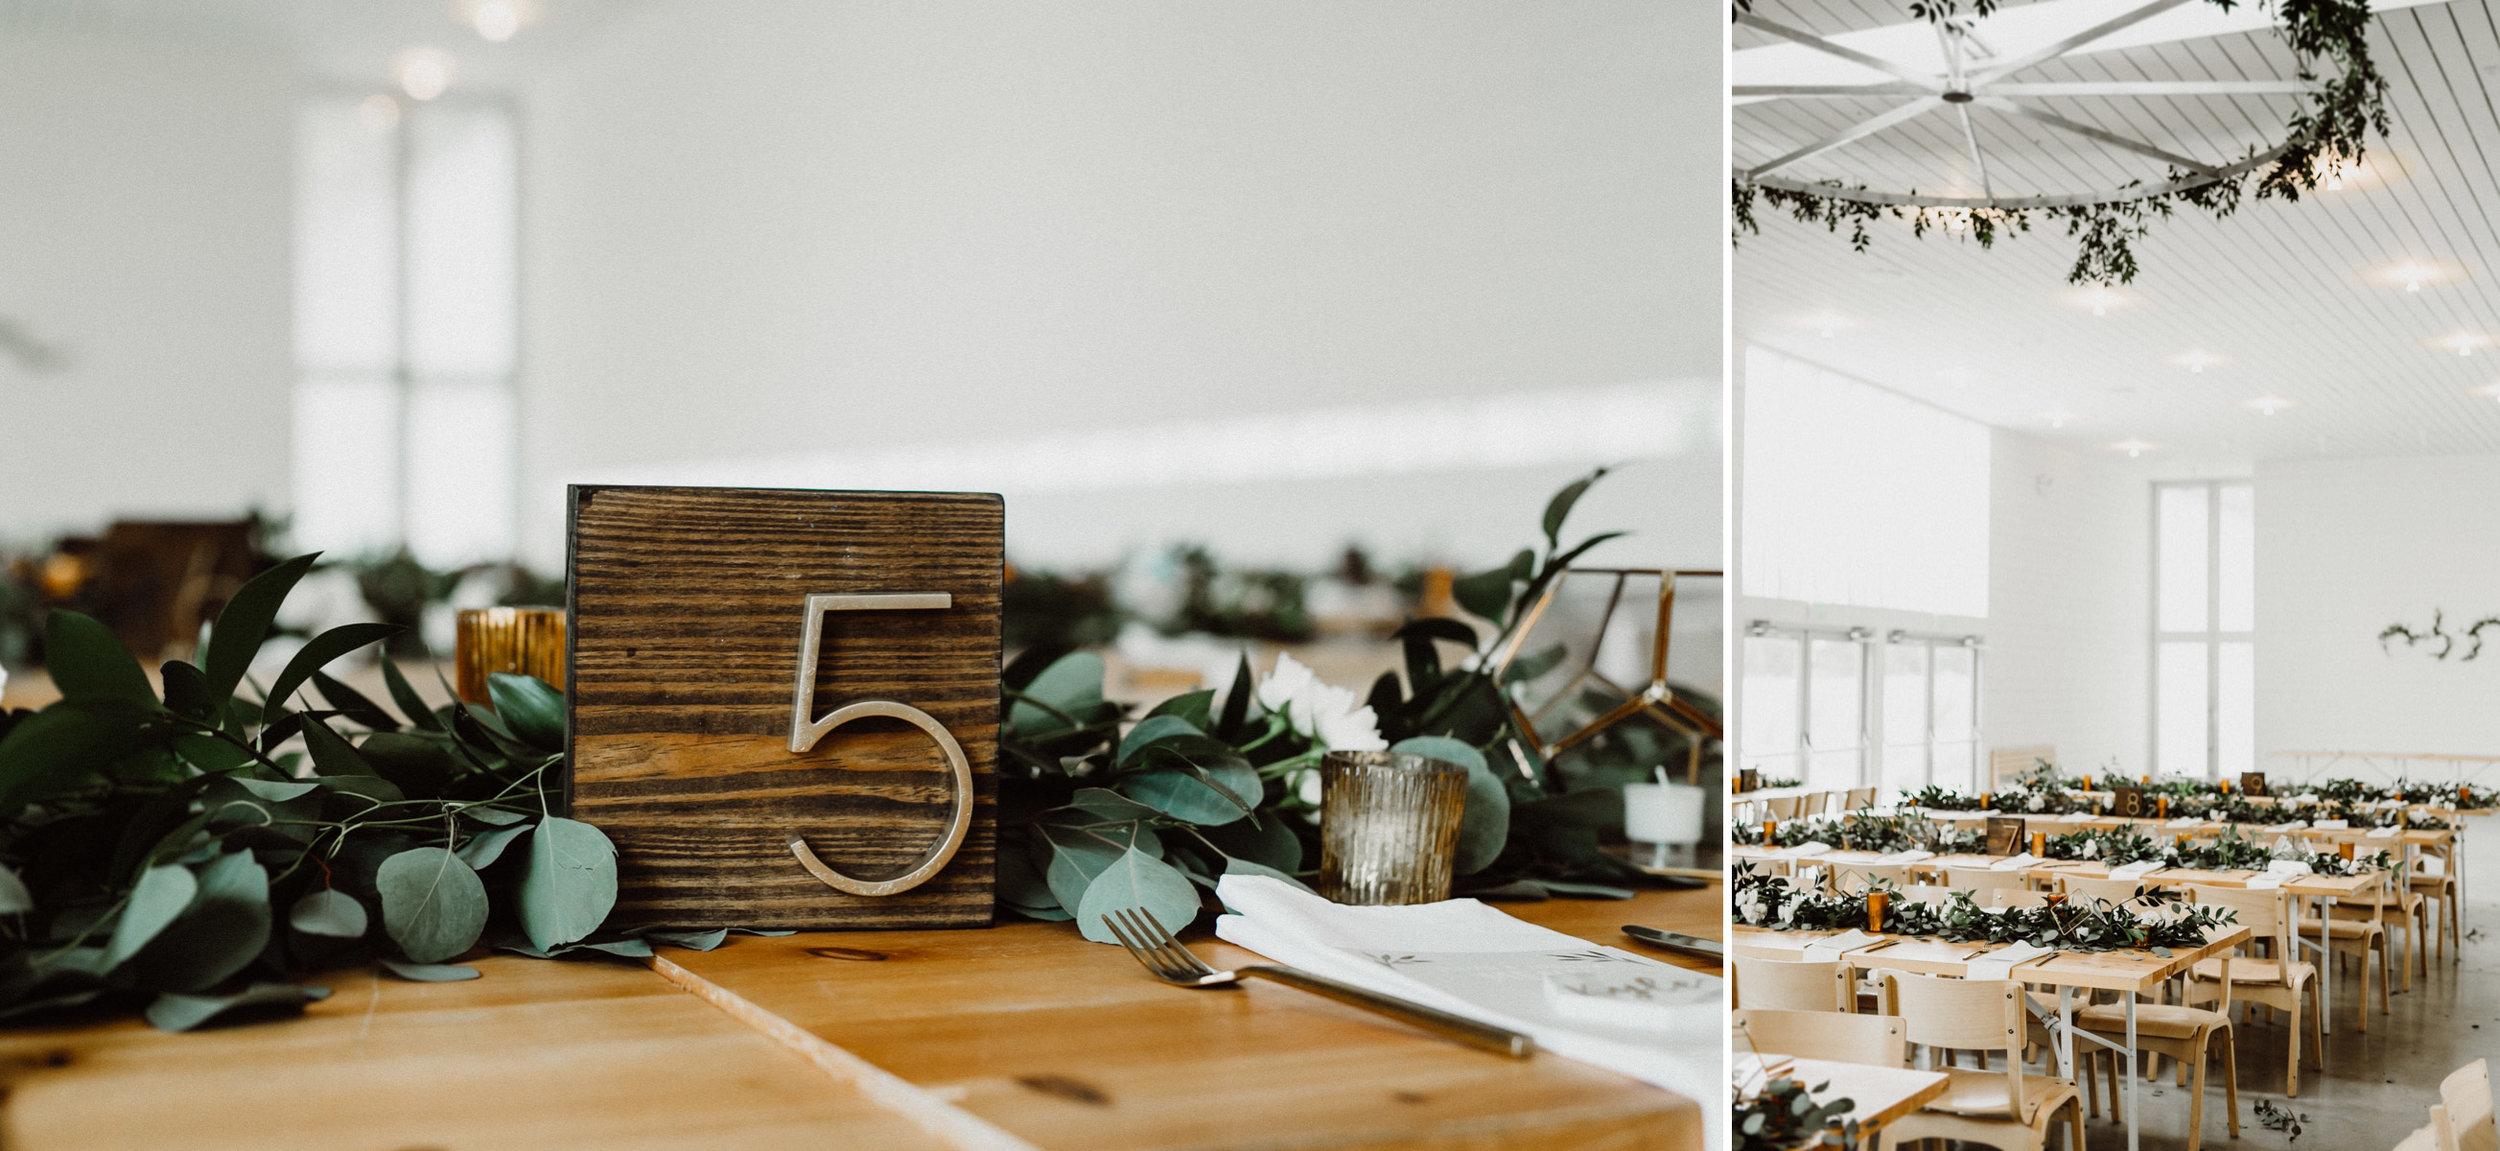 prospect-house-wedding-2.jpg